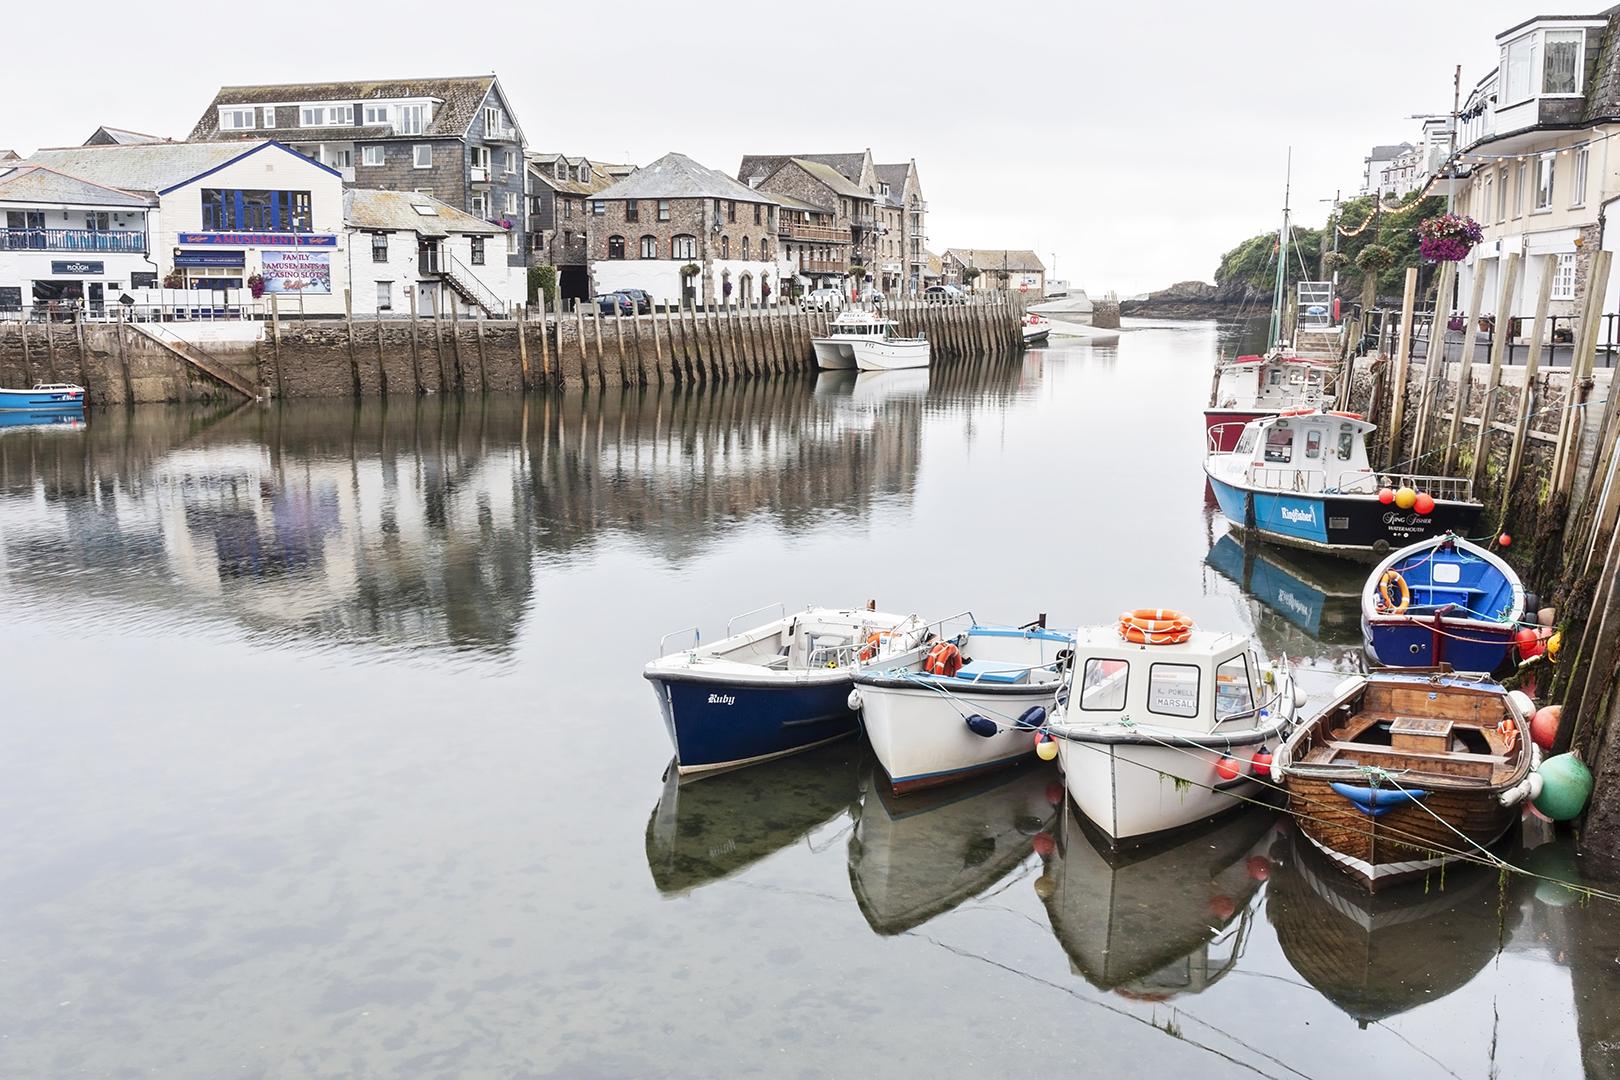 looe harbour reflections_6.jpg